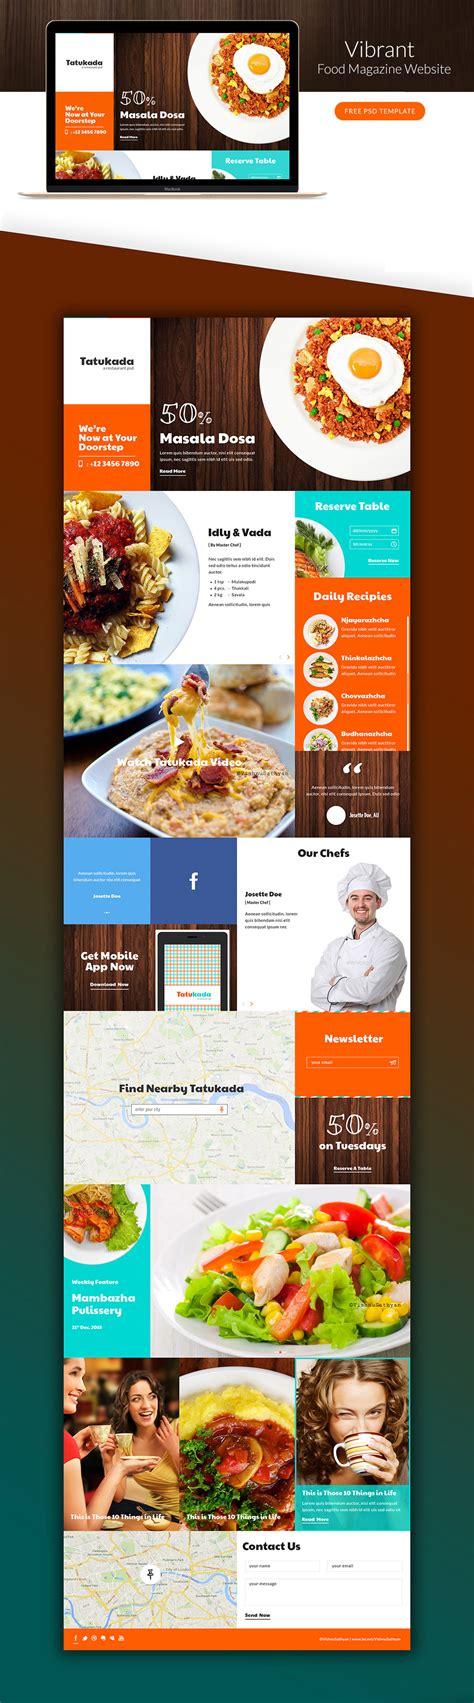 cuisine site vibrant food magazine website template free psd